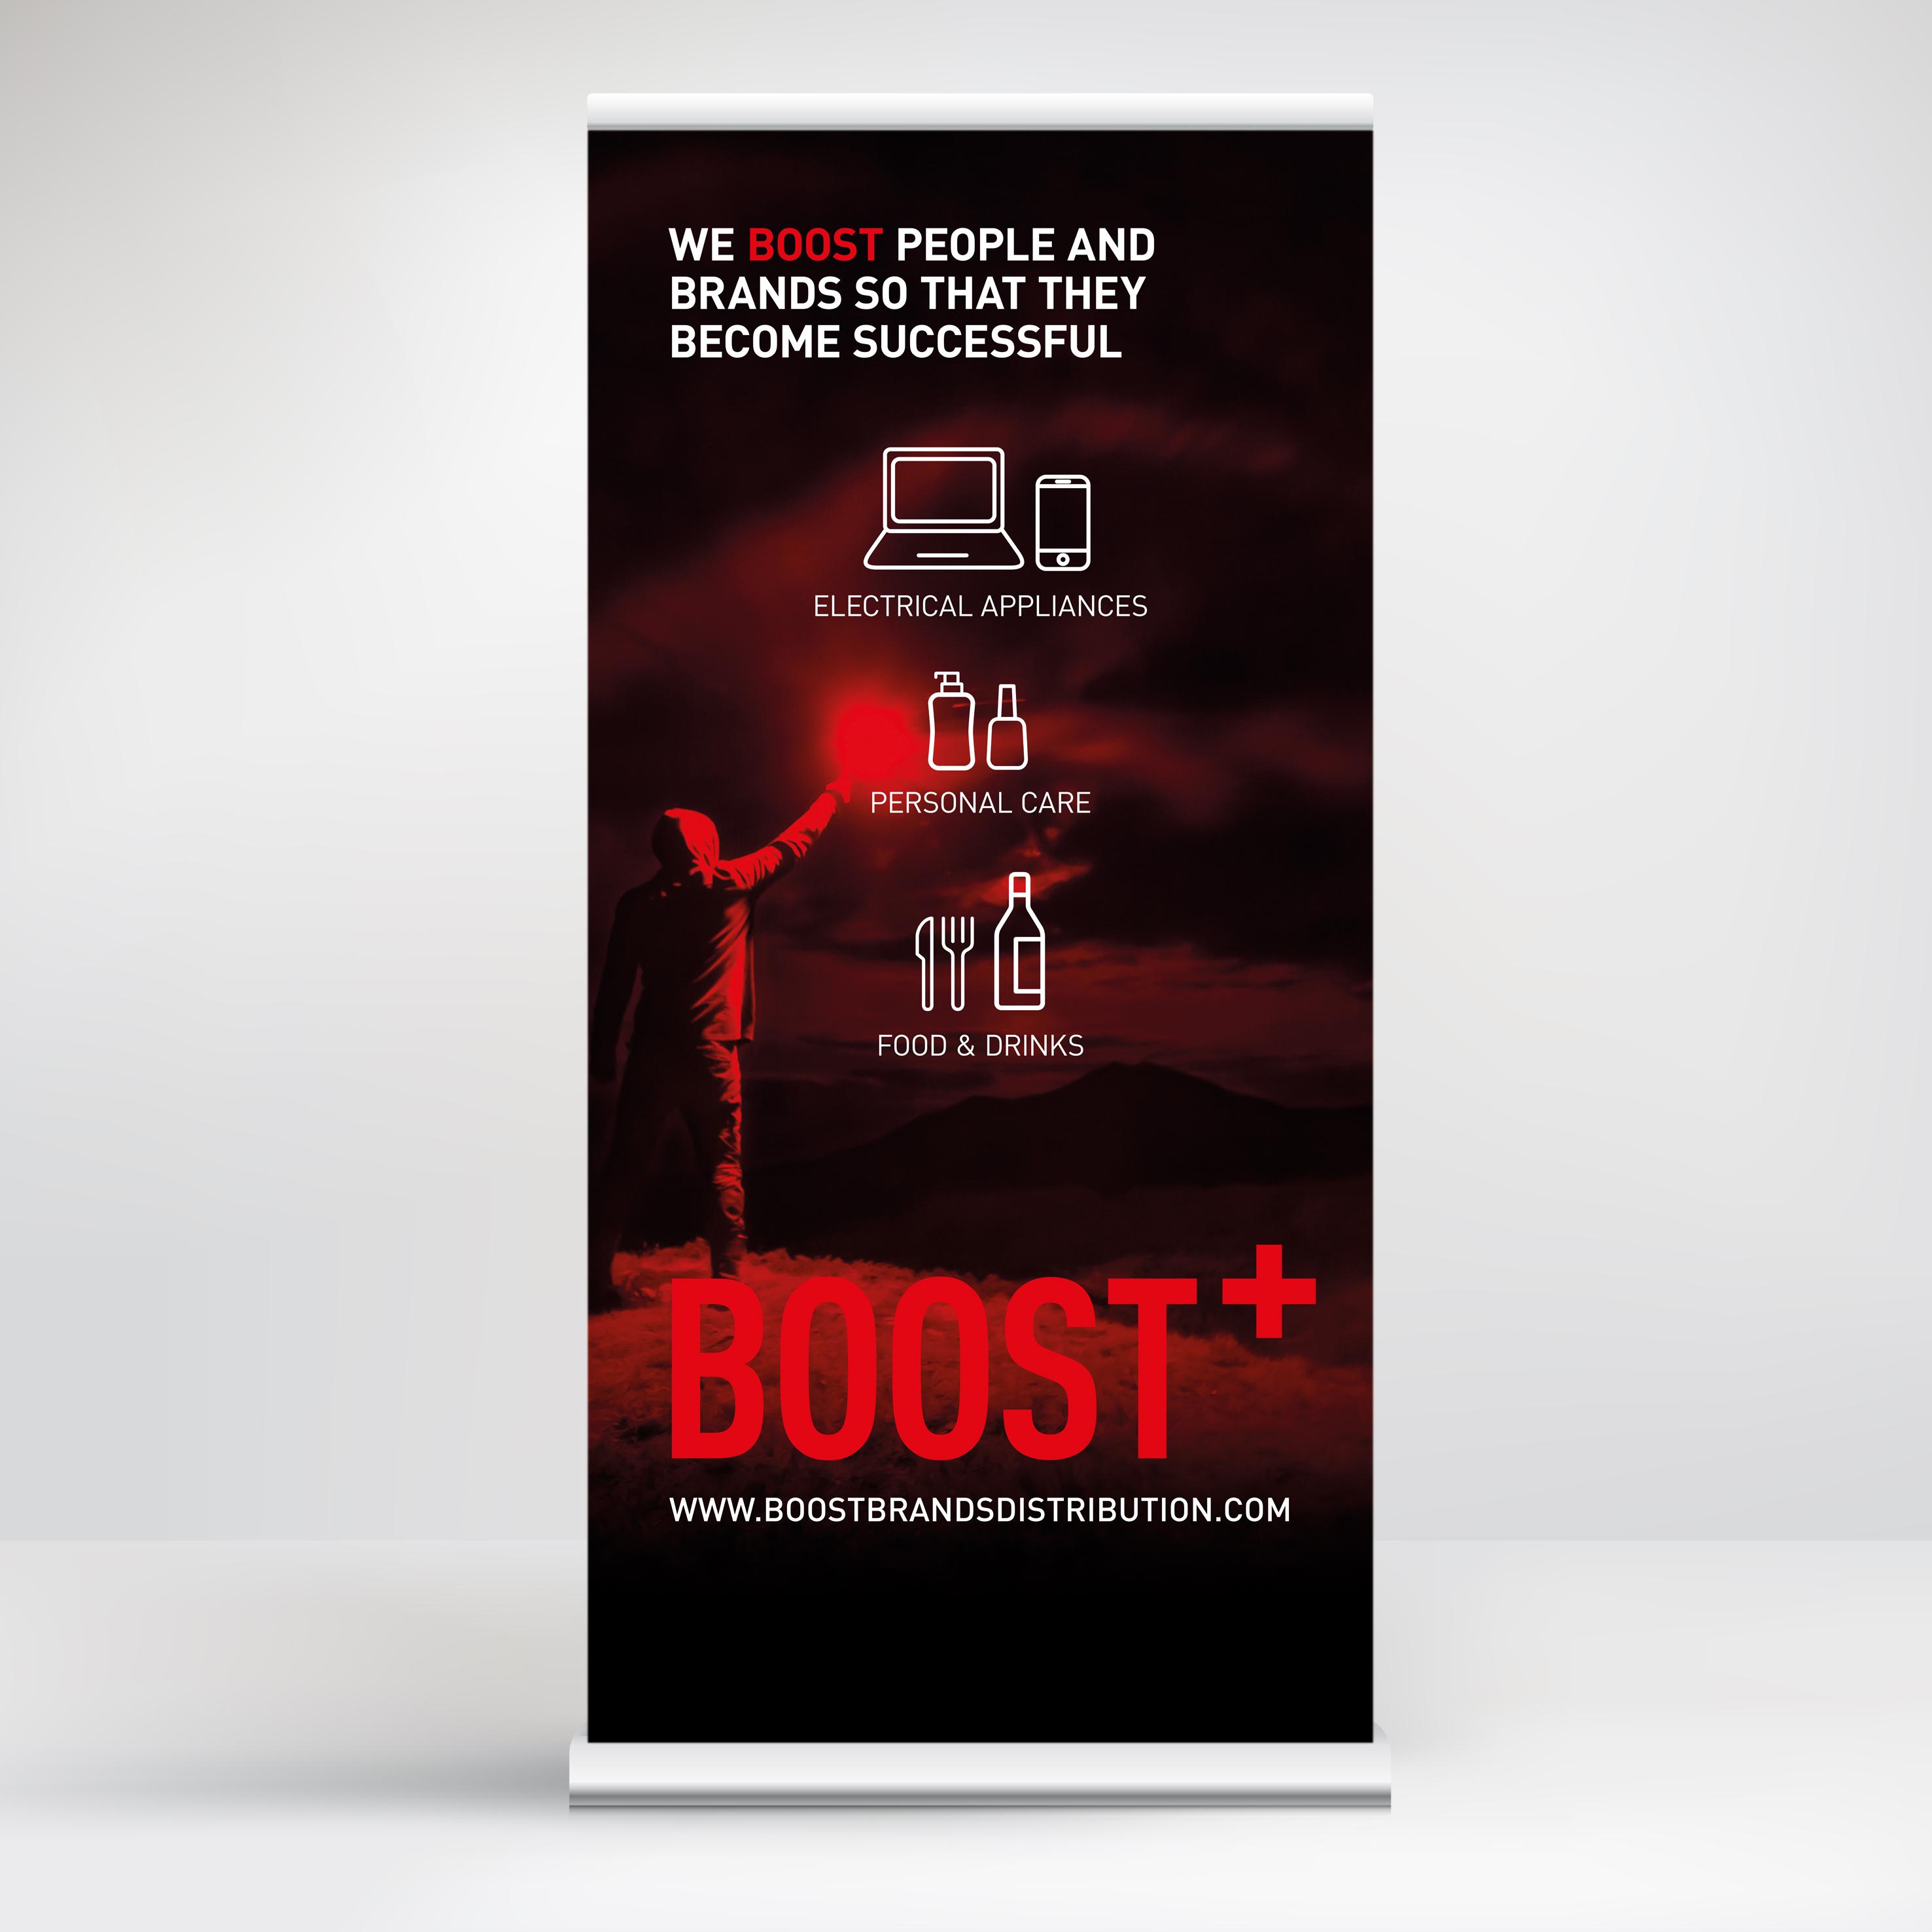 Boost+ brands distribution